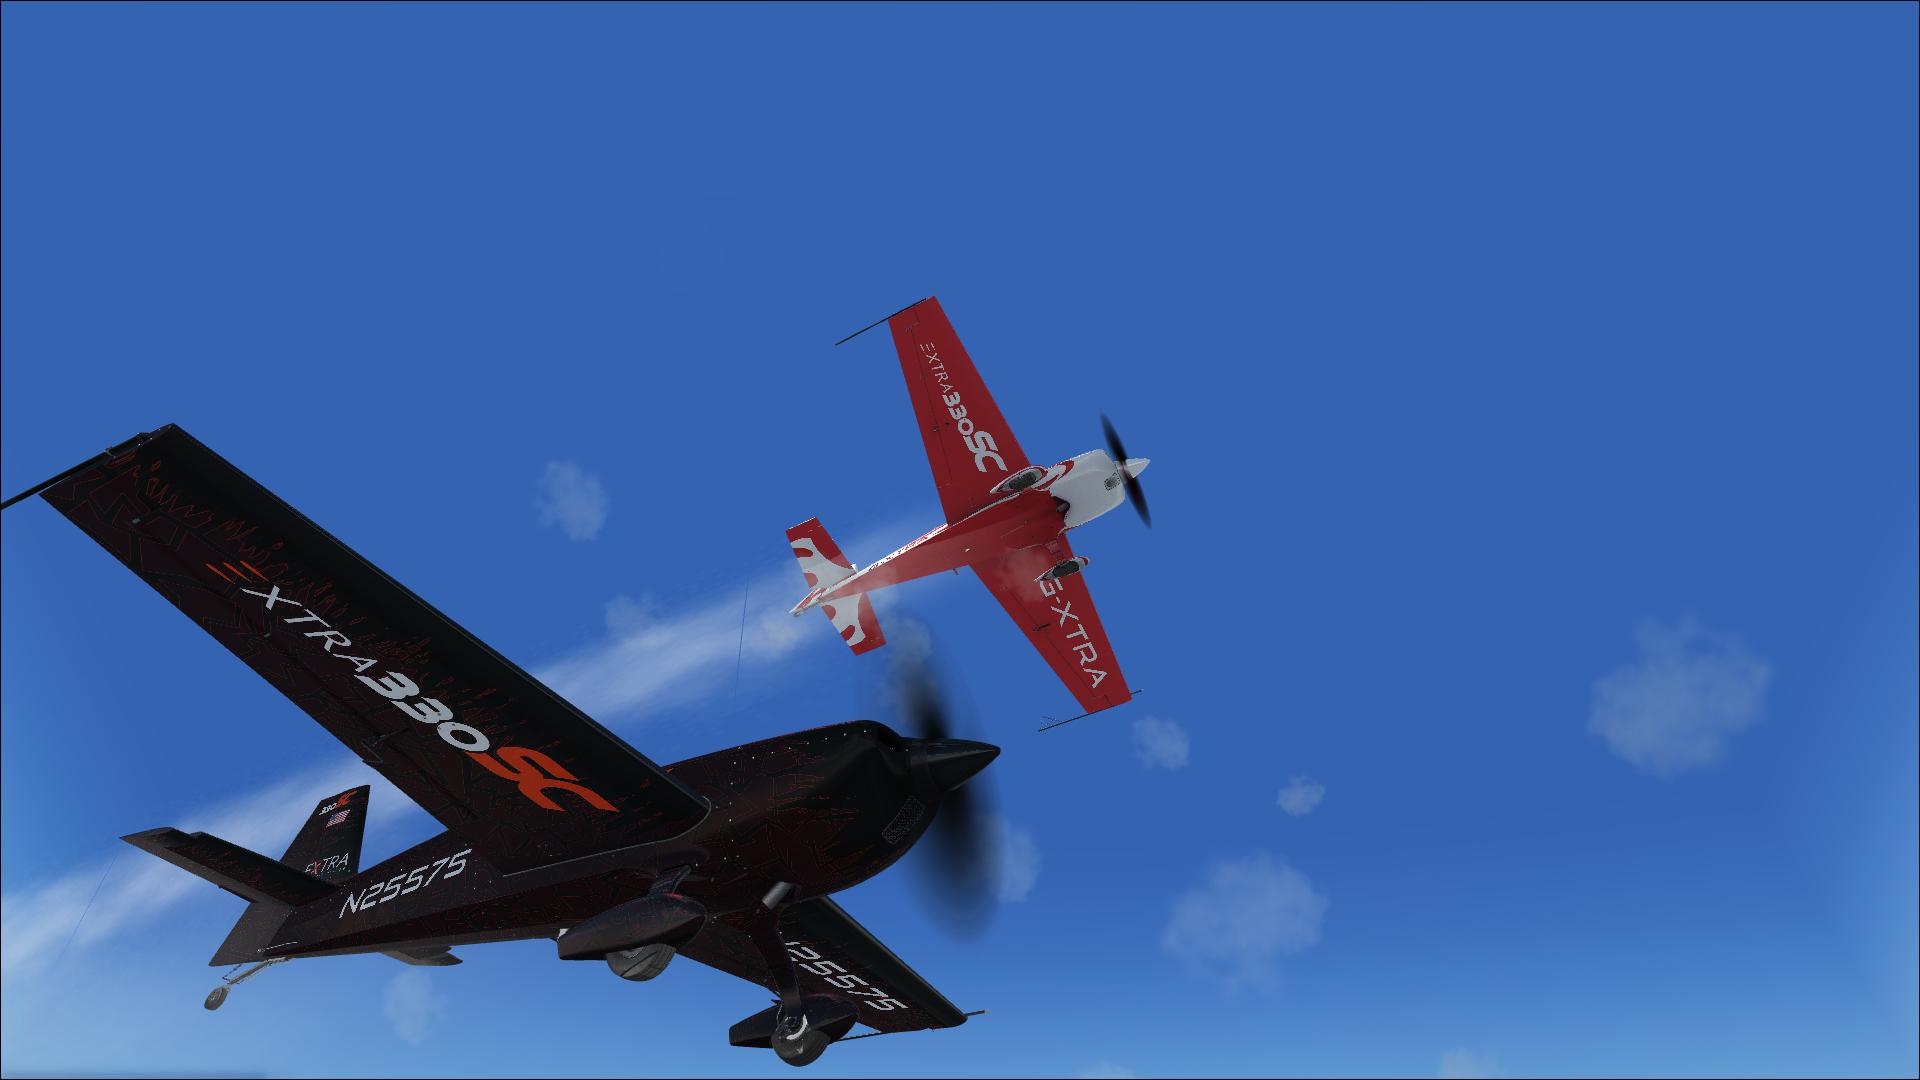 FSX: Steam Edition - Skychaser Add-On